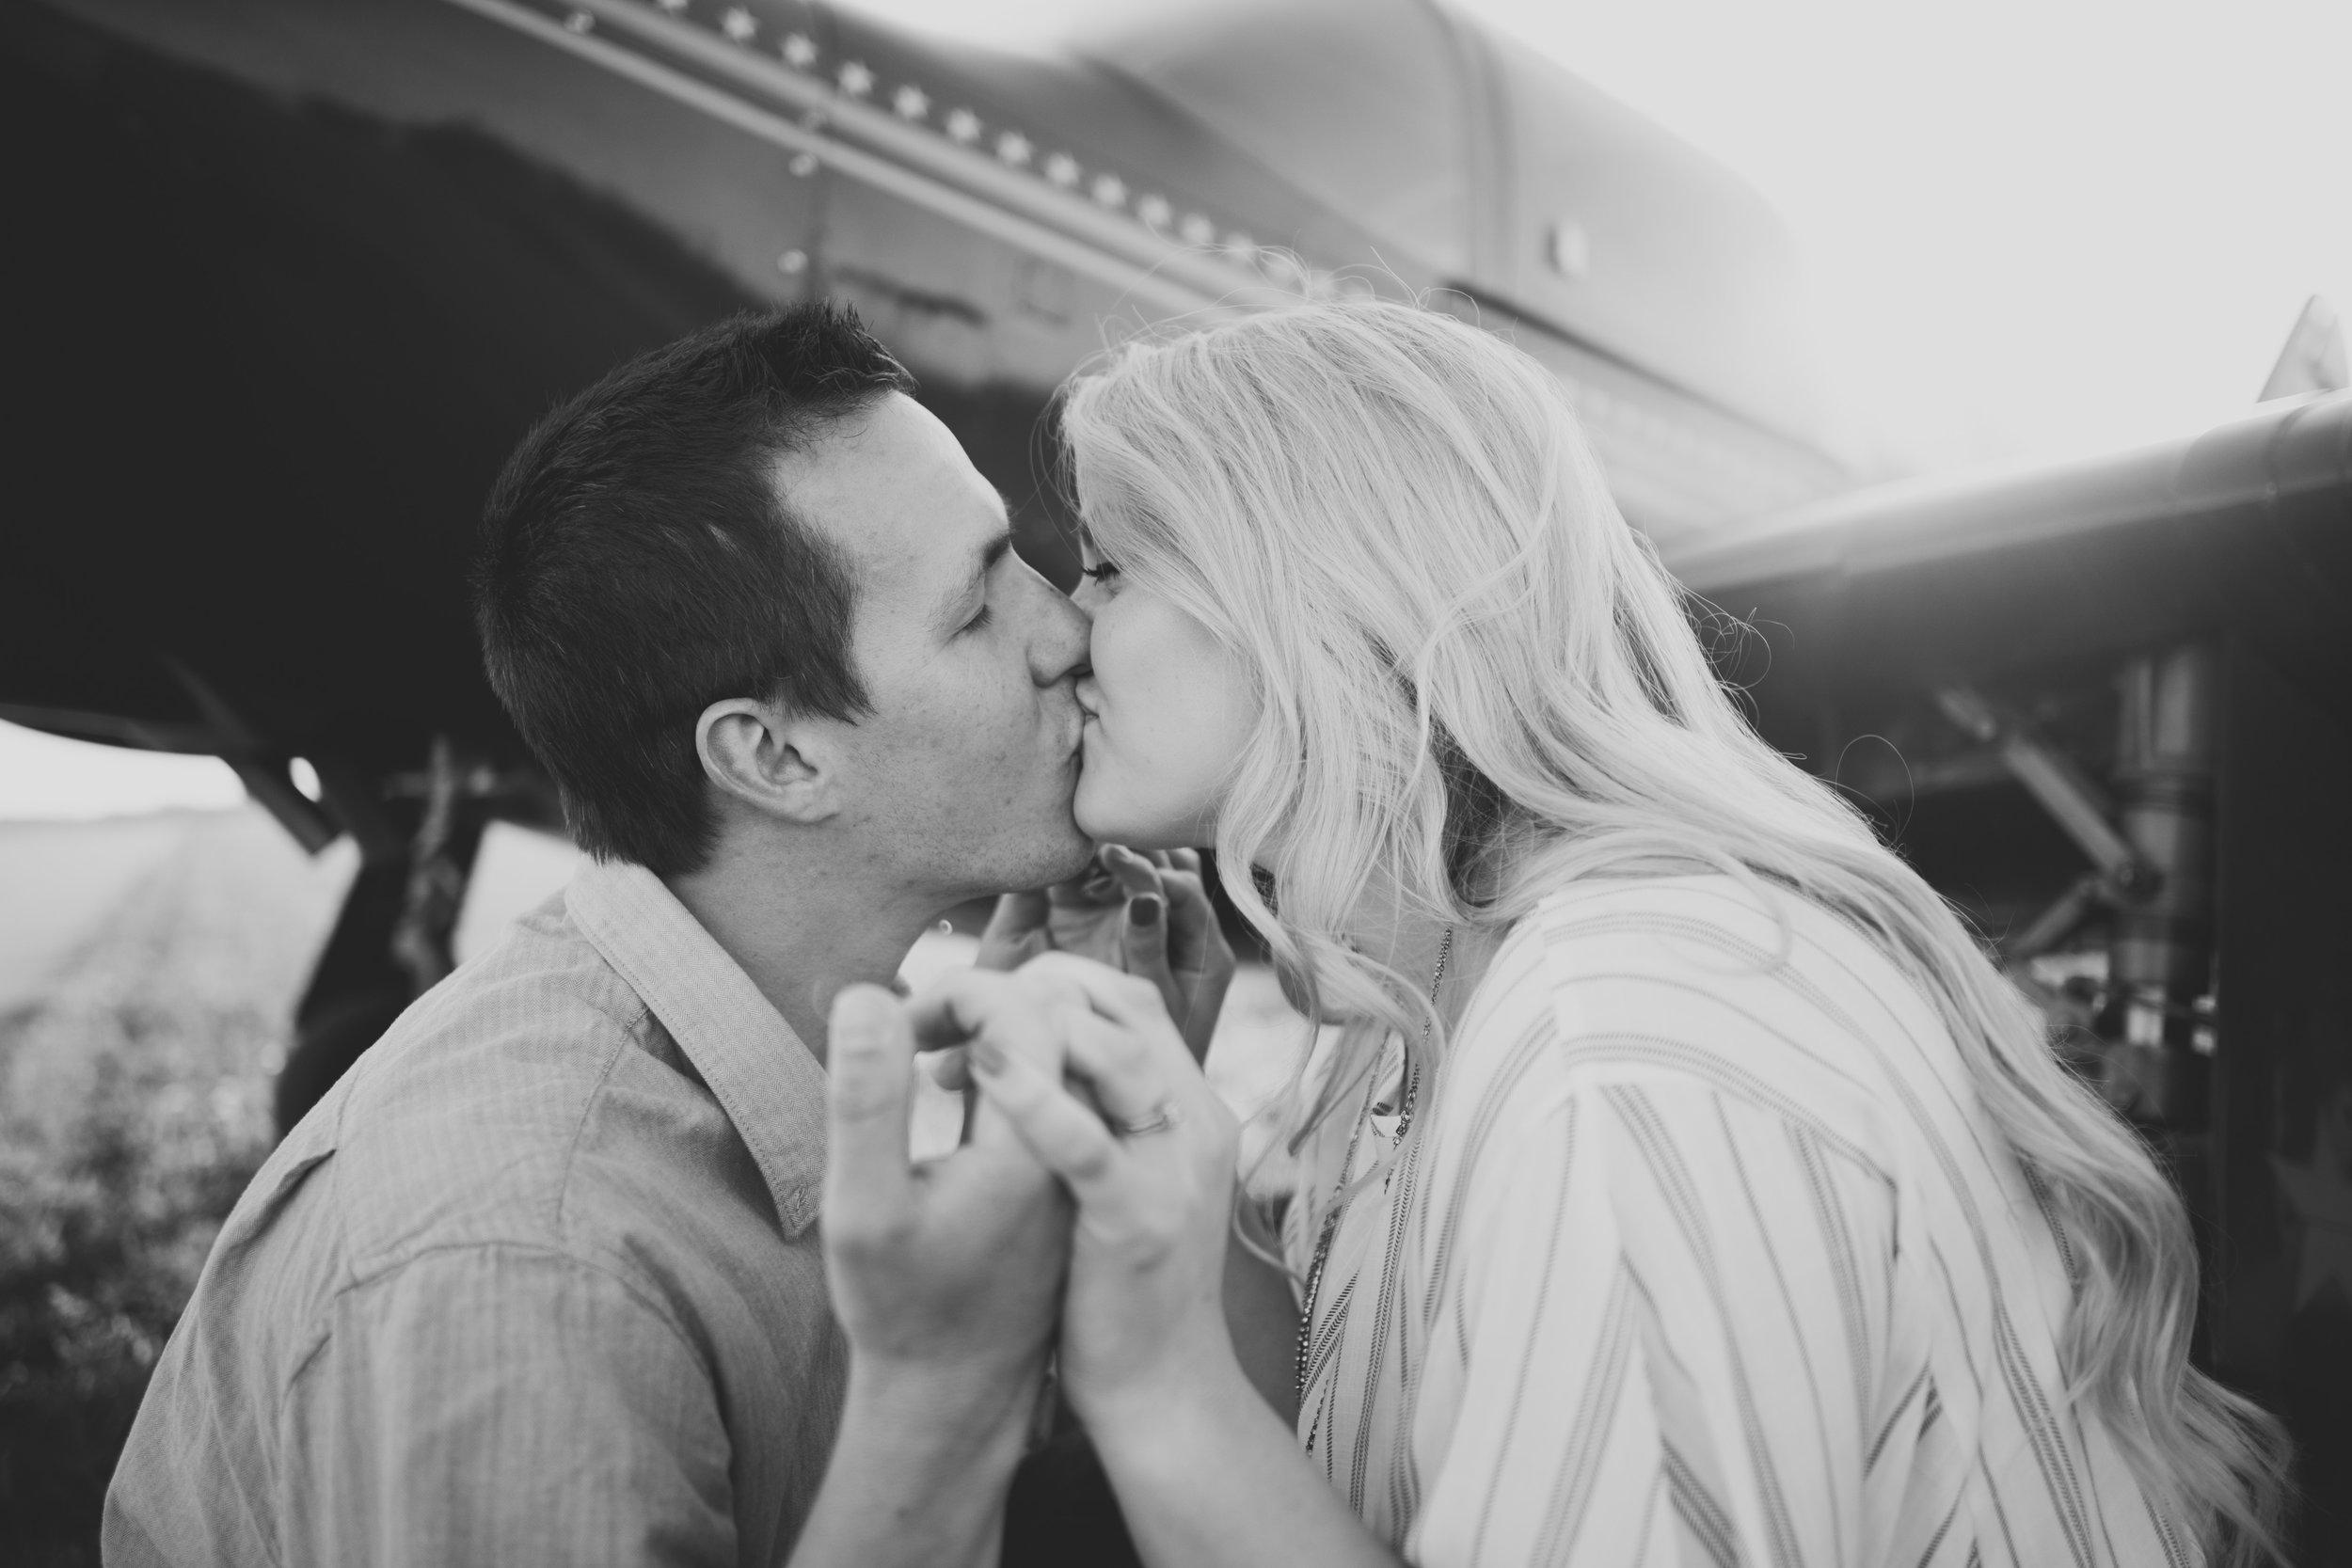 Grand Rapids Photographer - J Darling Photo - jessica darling - grand rapids wedding photographer - sparta airport - sparta michigan - jasmine and jeff engaged 031.jpg